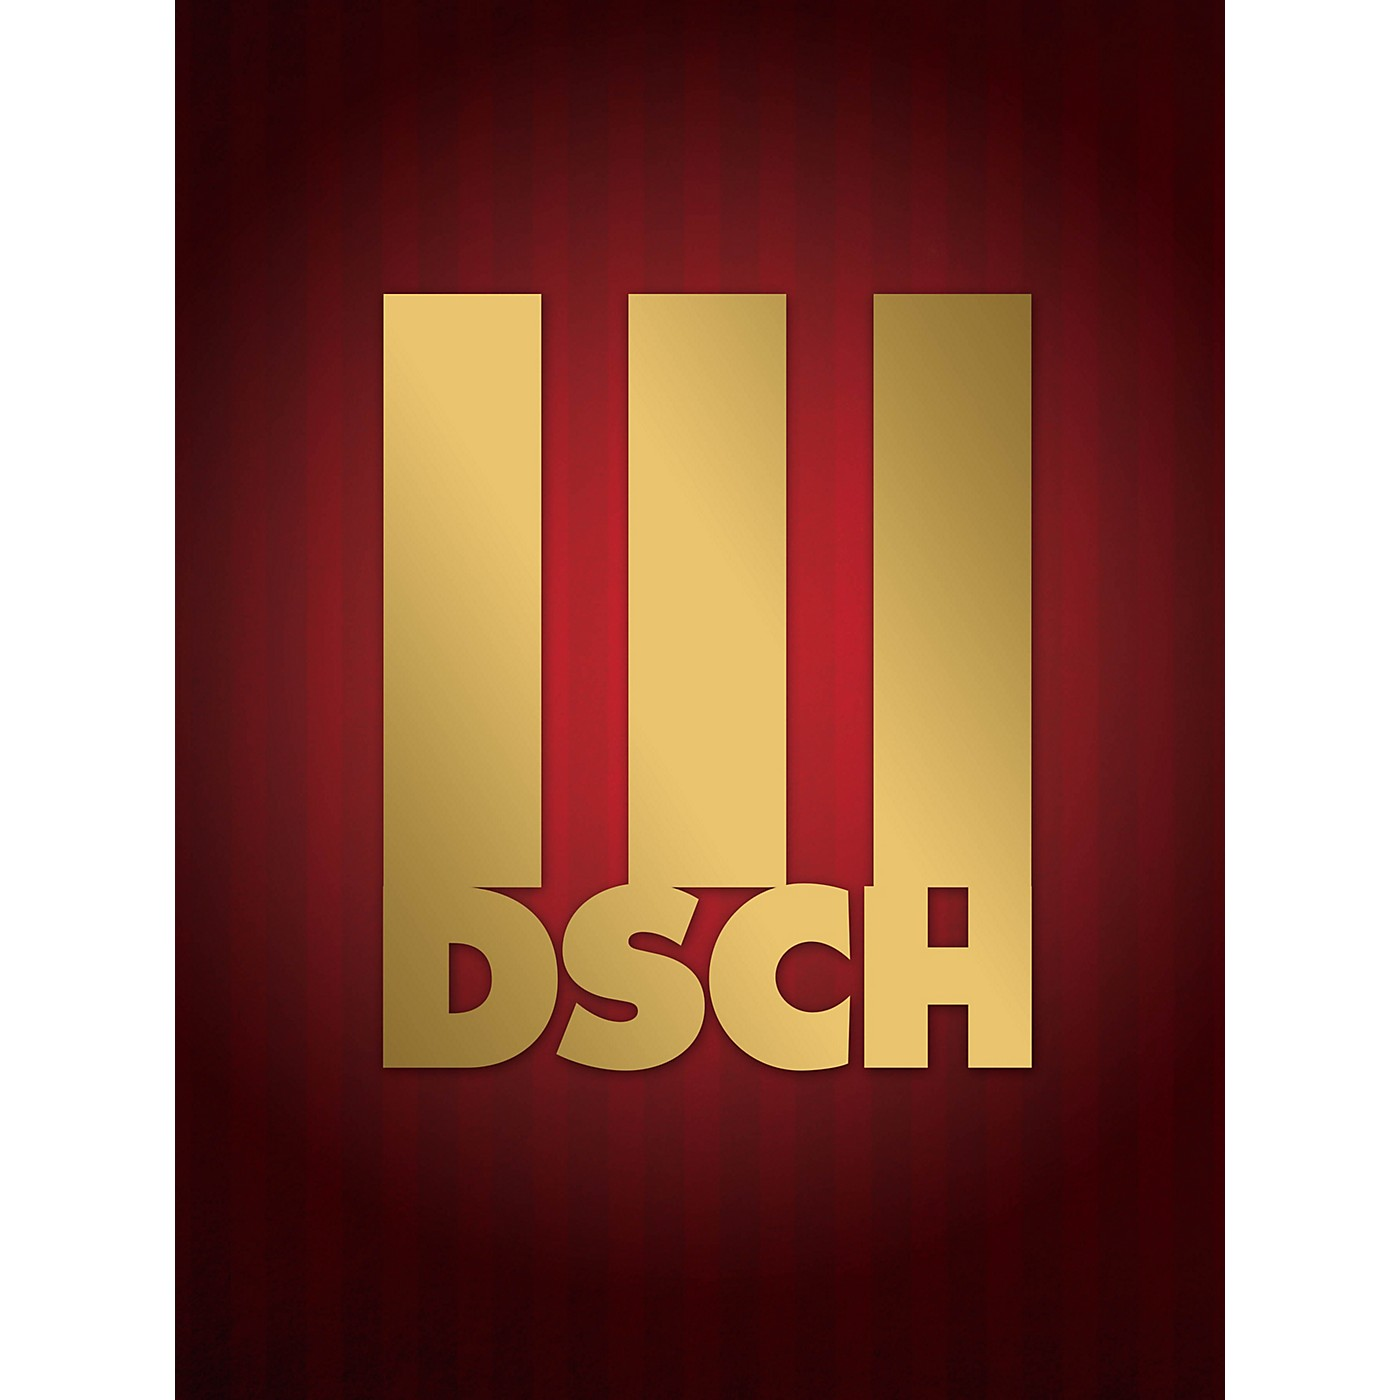 DSCH The Nose Op. 15 DSCH Series Hardcover  by Dmitri Shostakovich thumbnail